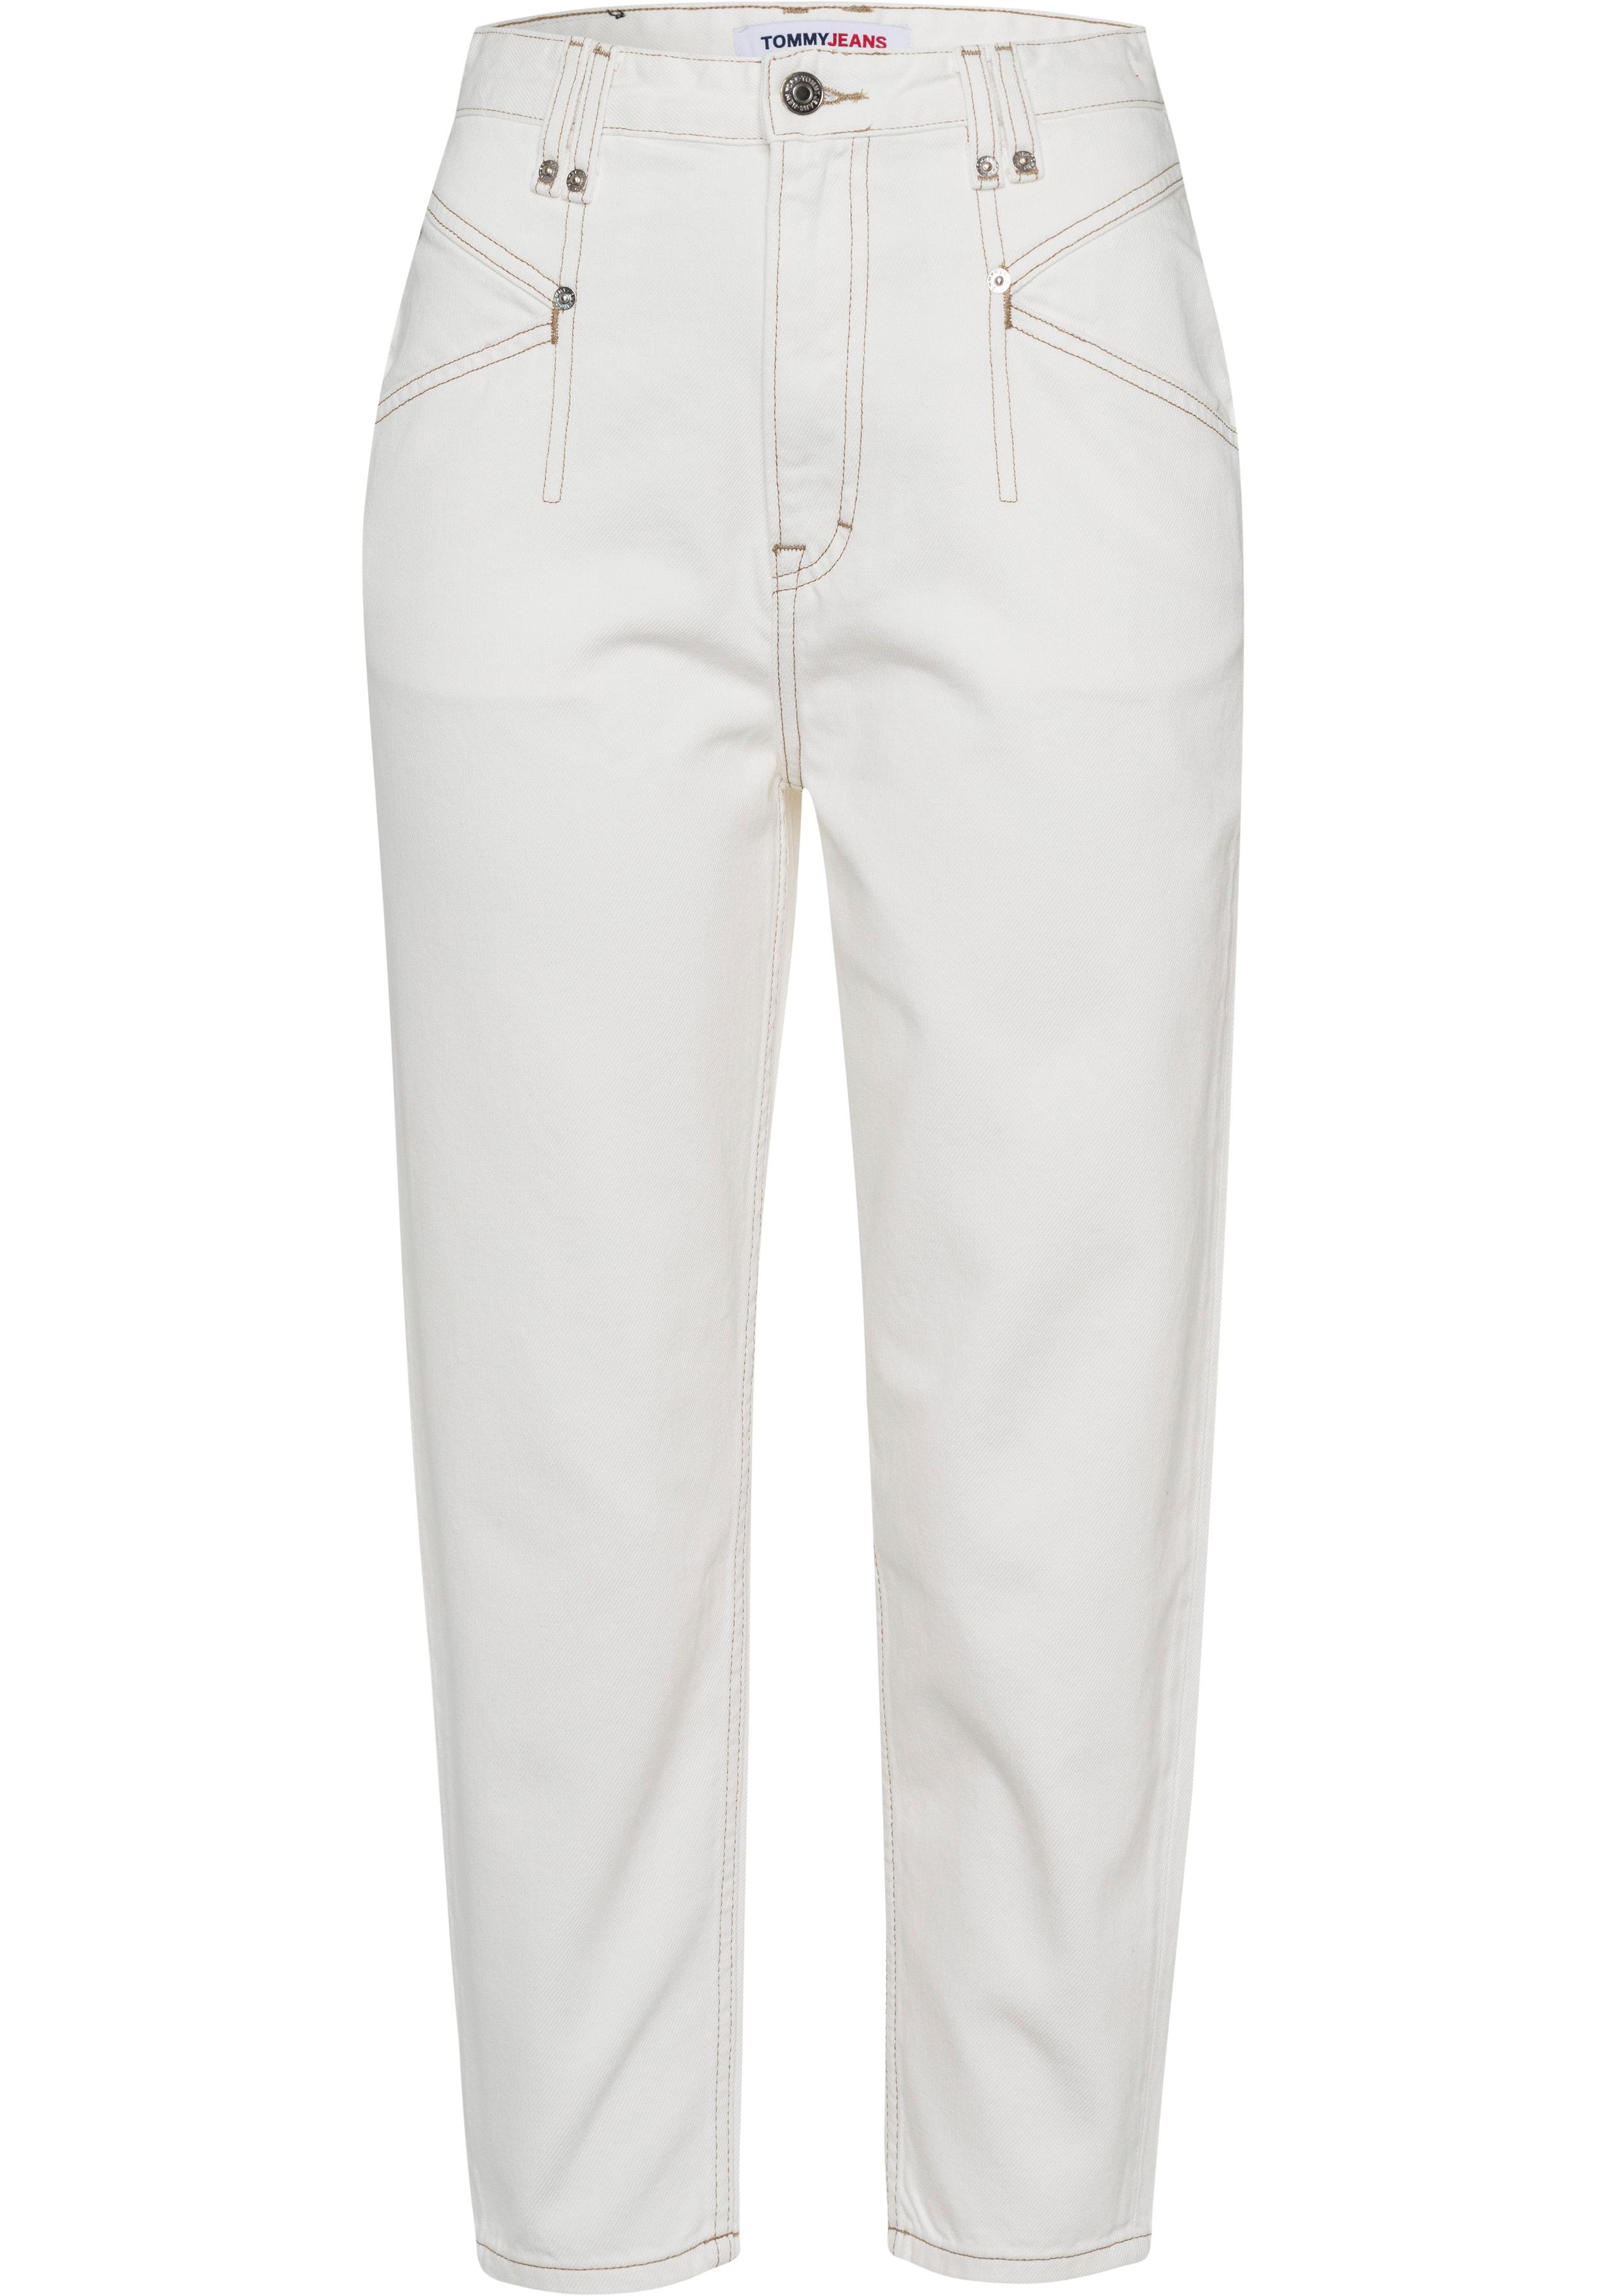 tommy jeans -  Mom-Jeans MOM JEAN KP UHR TPRD AE736 SMBR, mit modischen Abnähern vorn &  Logo-Badge